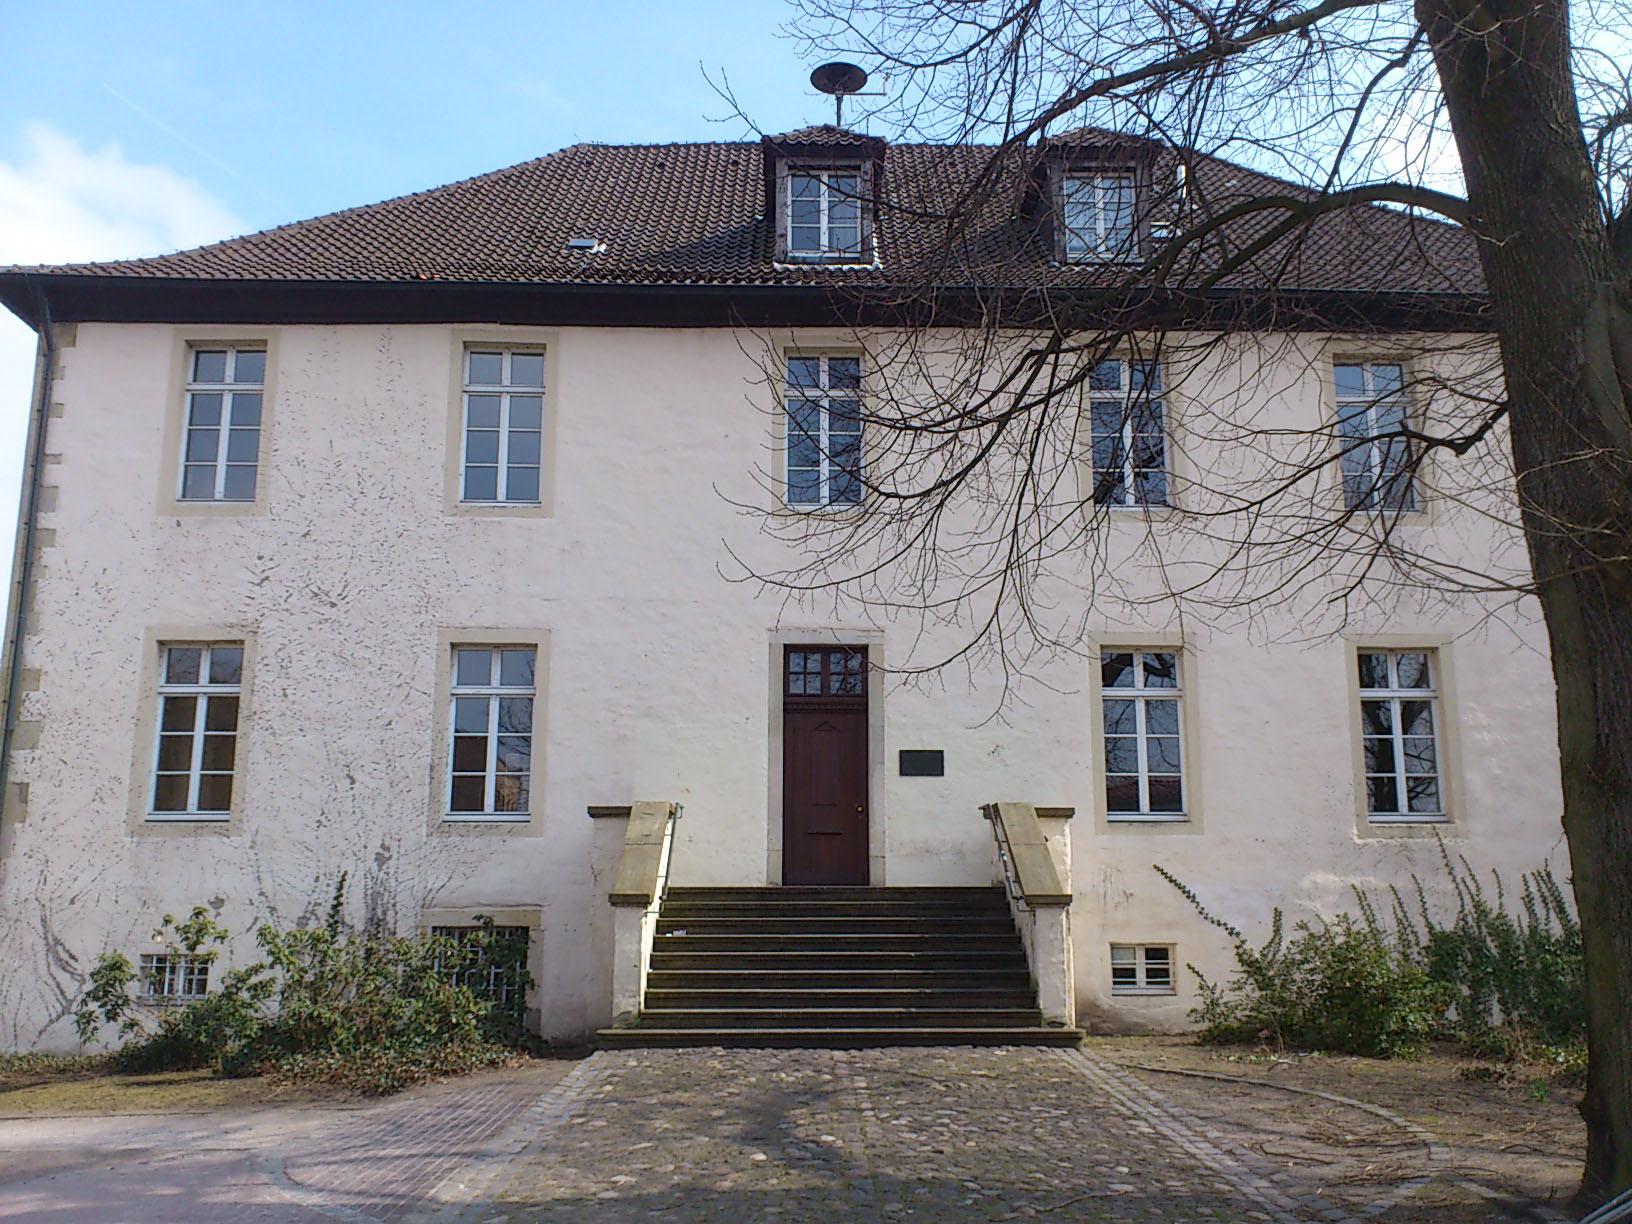 Burg Botzlar Selm